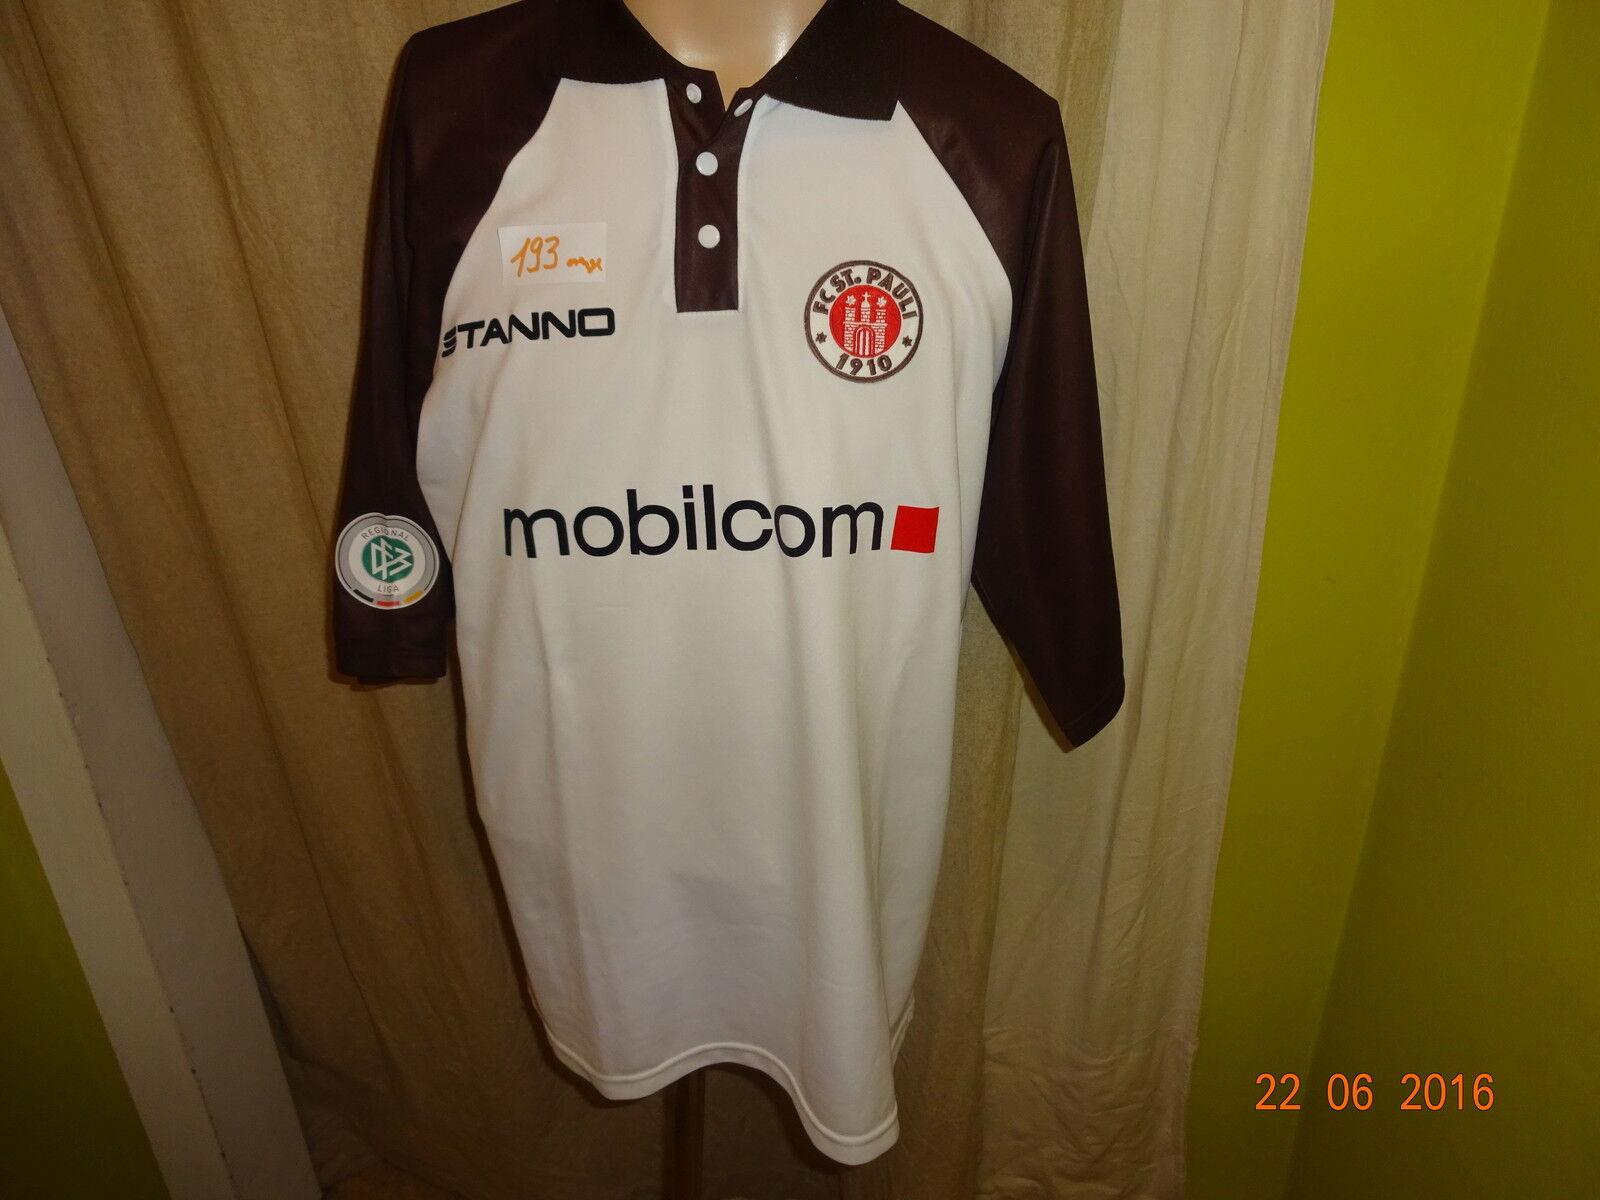 FC St.Pauli Stanno Matchworn Trikot 2003 2003 2003 04 + Nr.24 Gruszka + Handsigniert Gr.XL df28d9